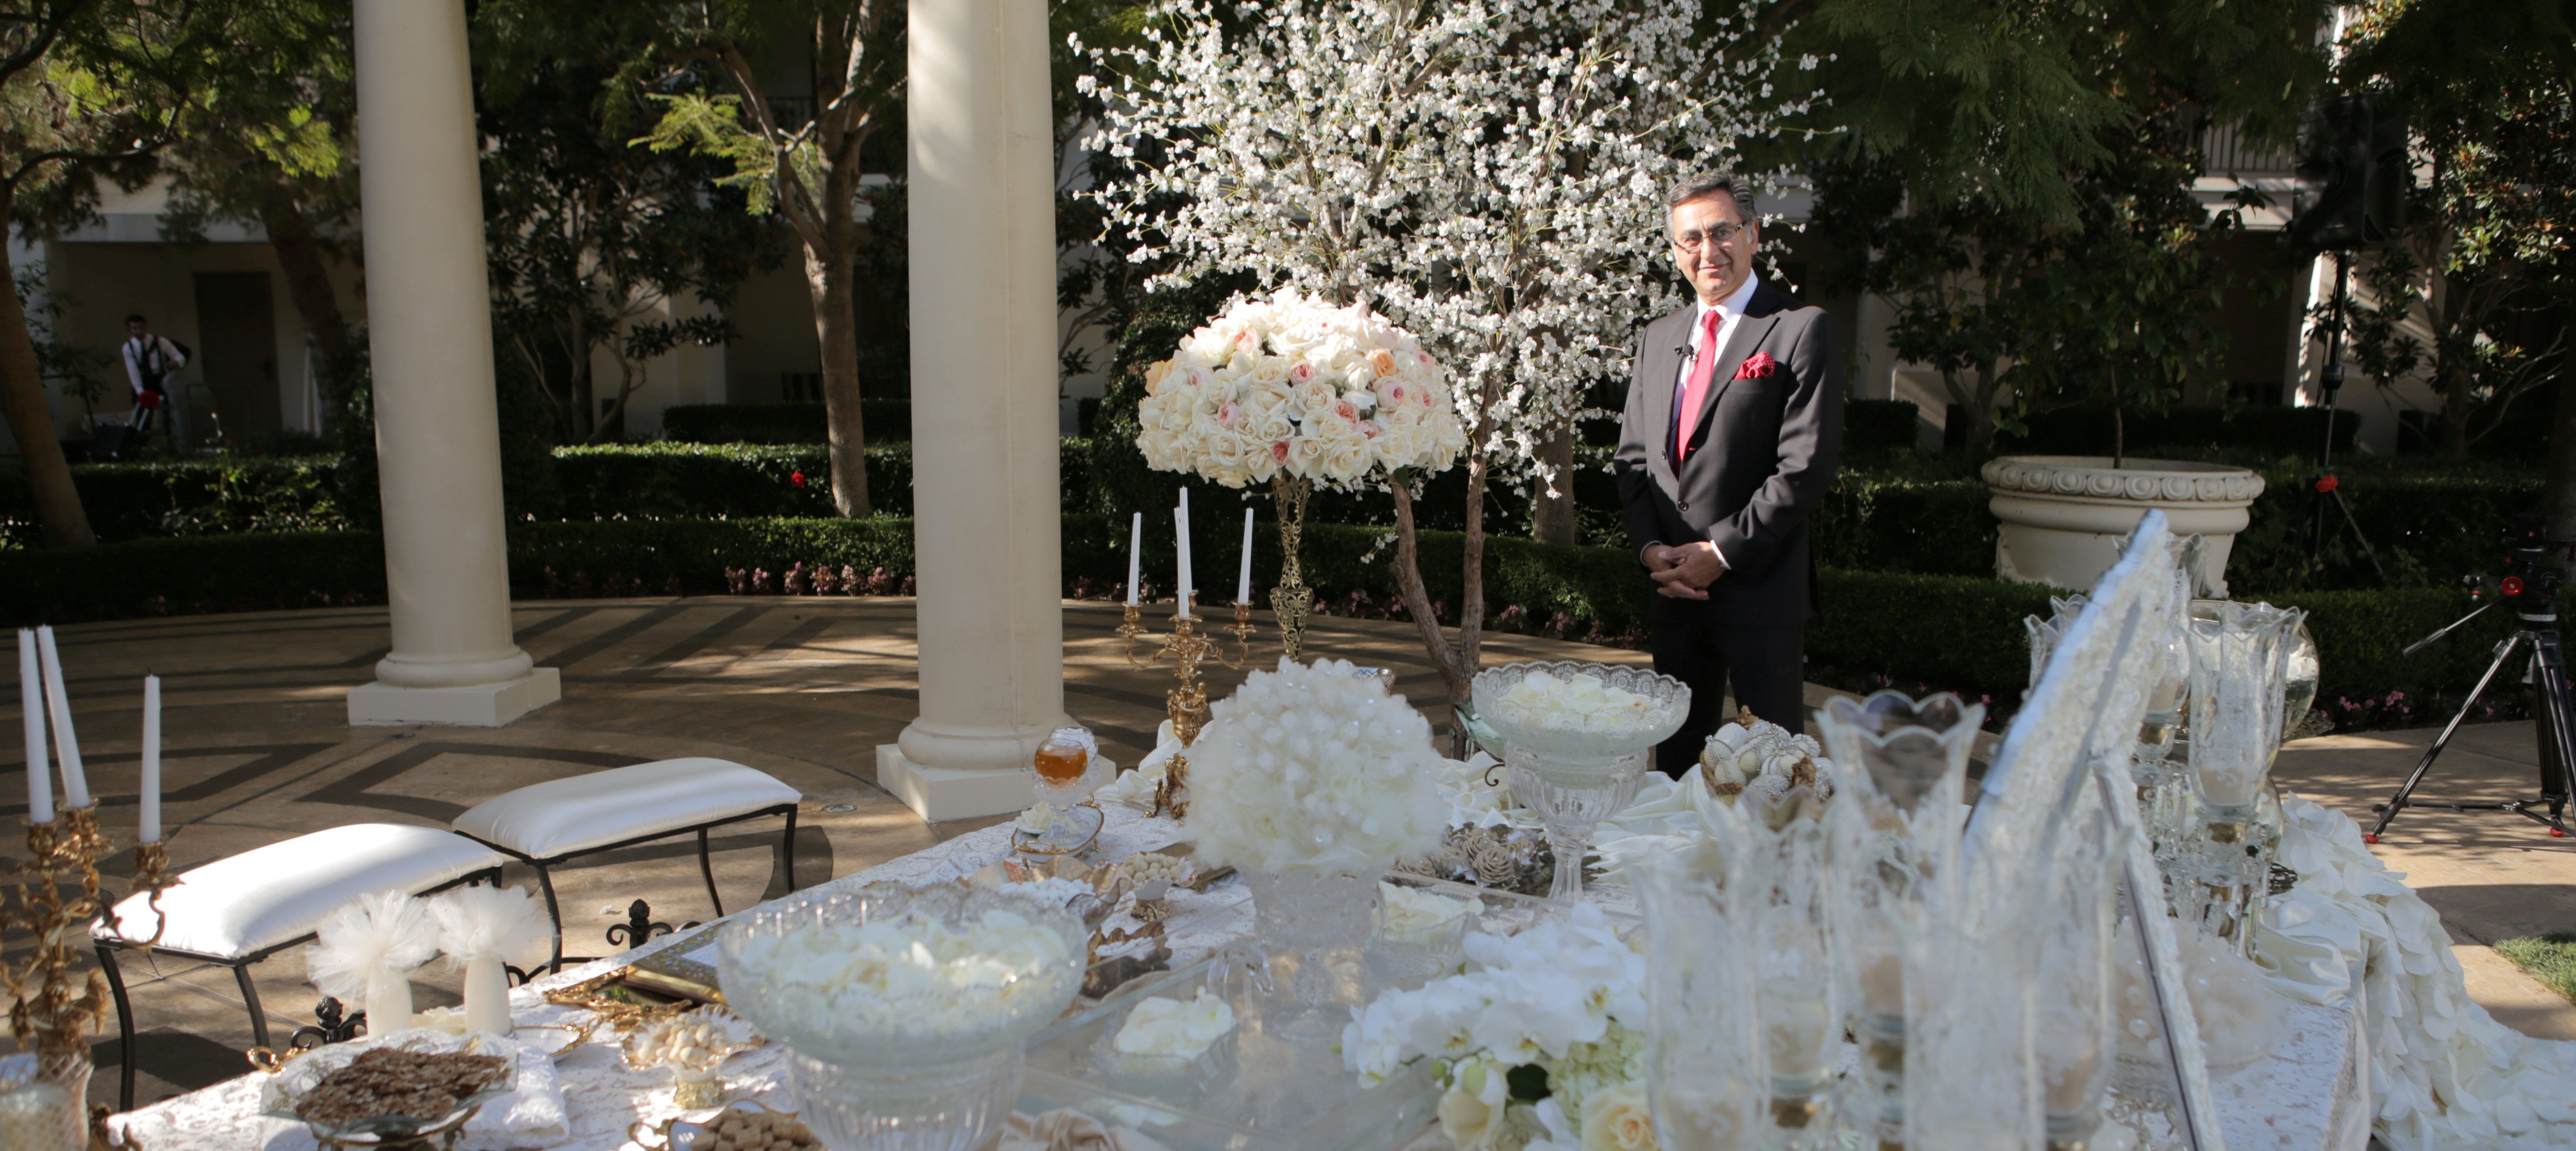 Yorkshire Wedding Cakes Persian